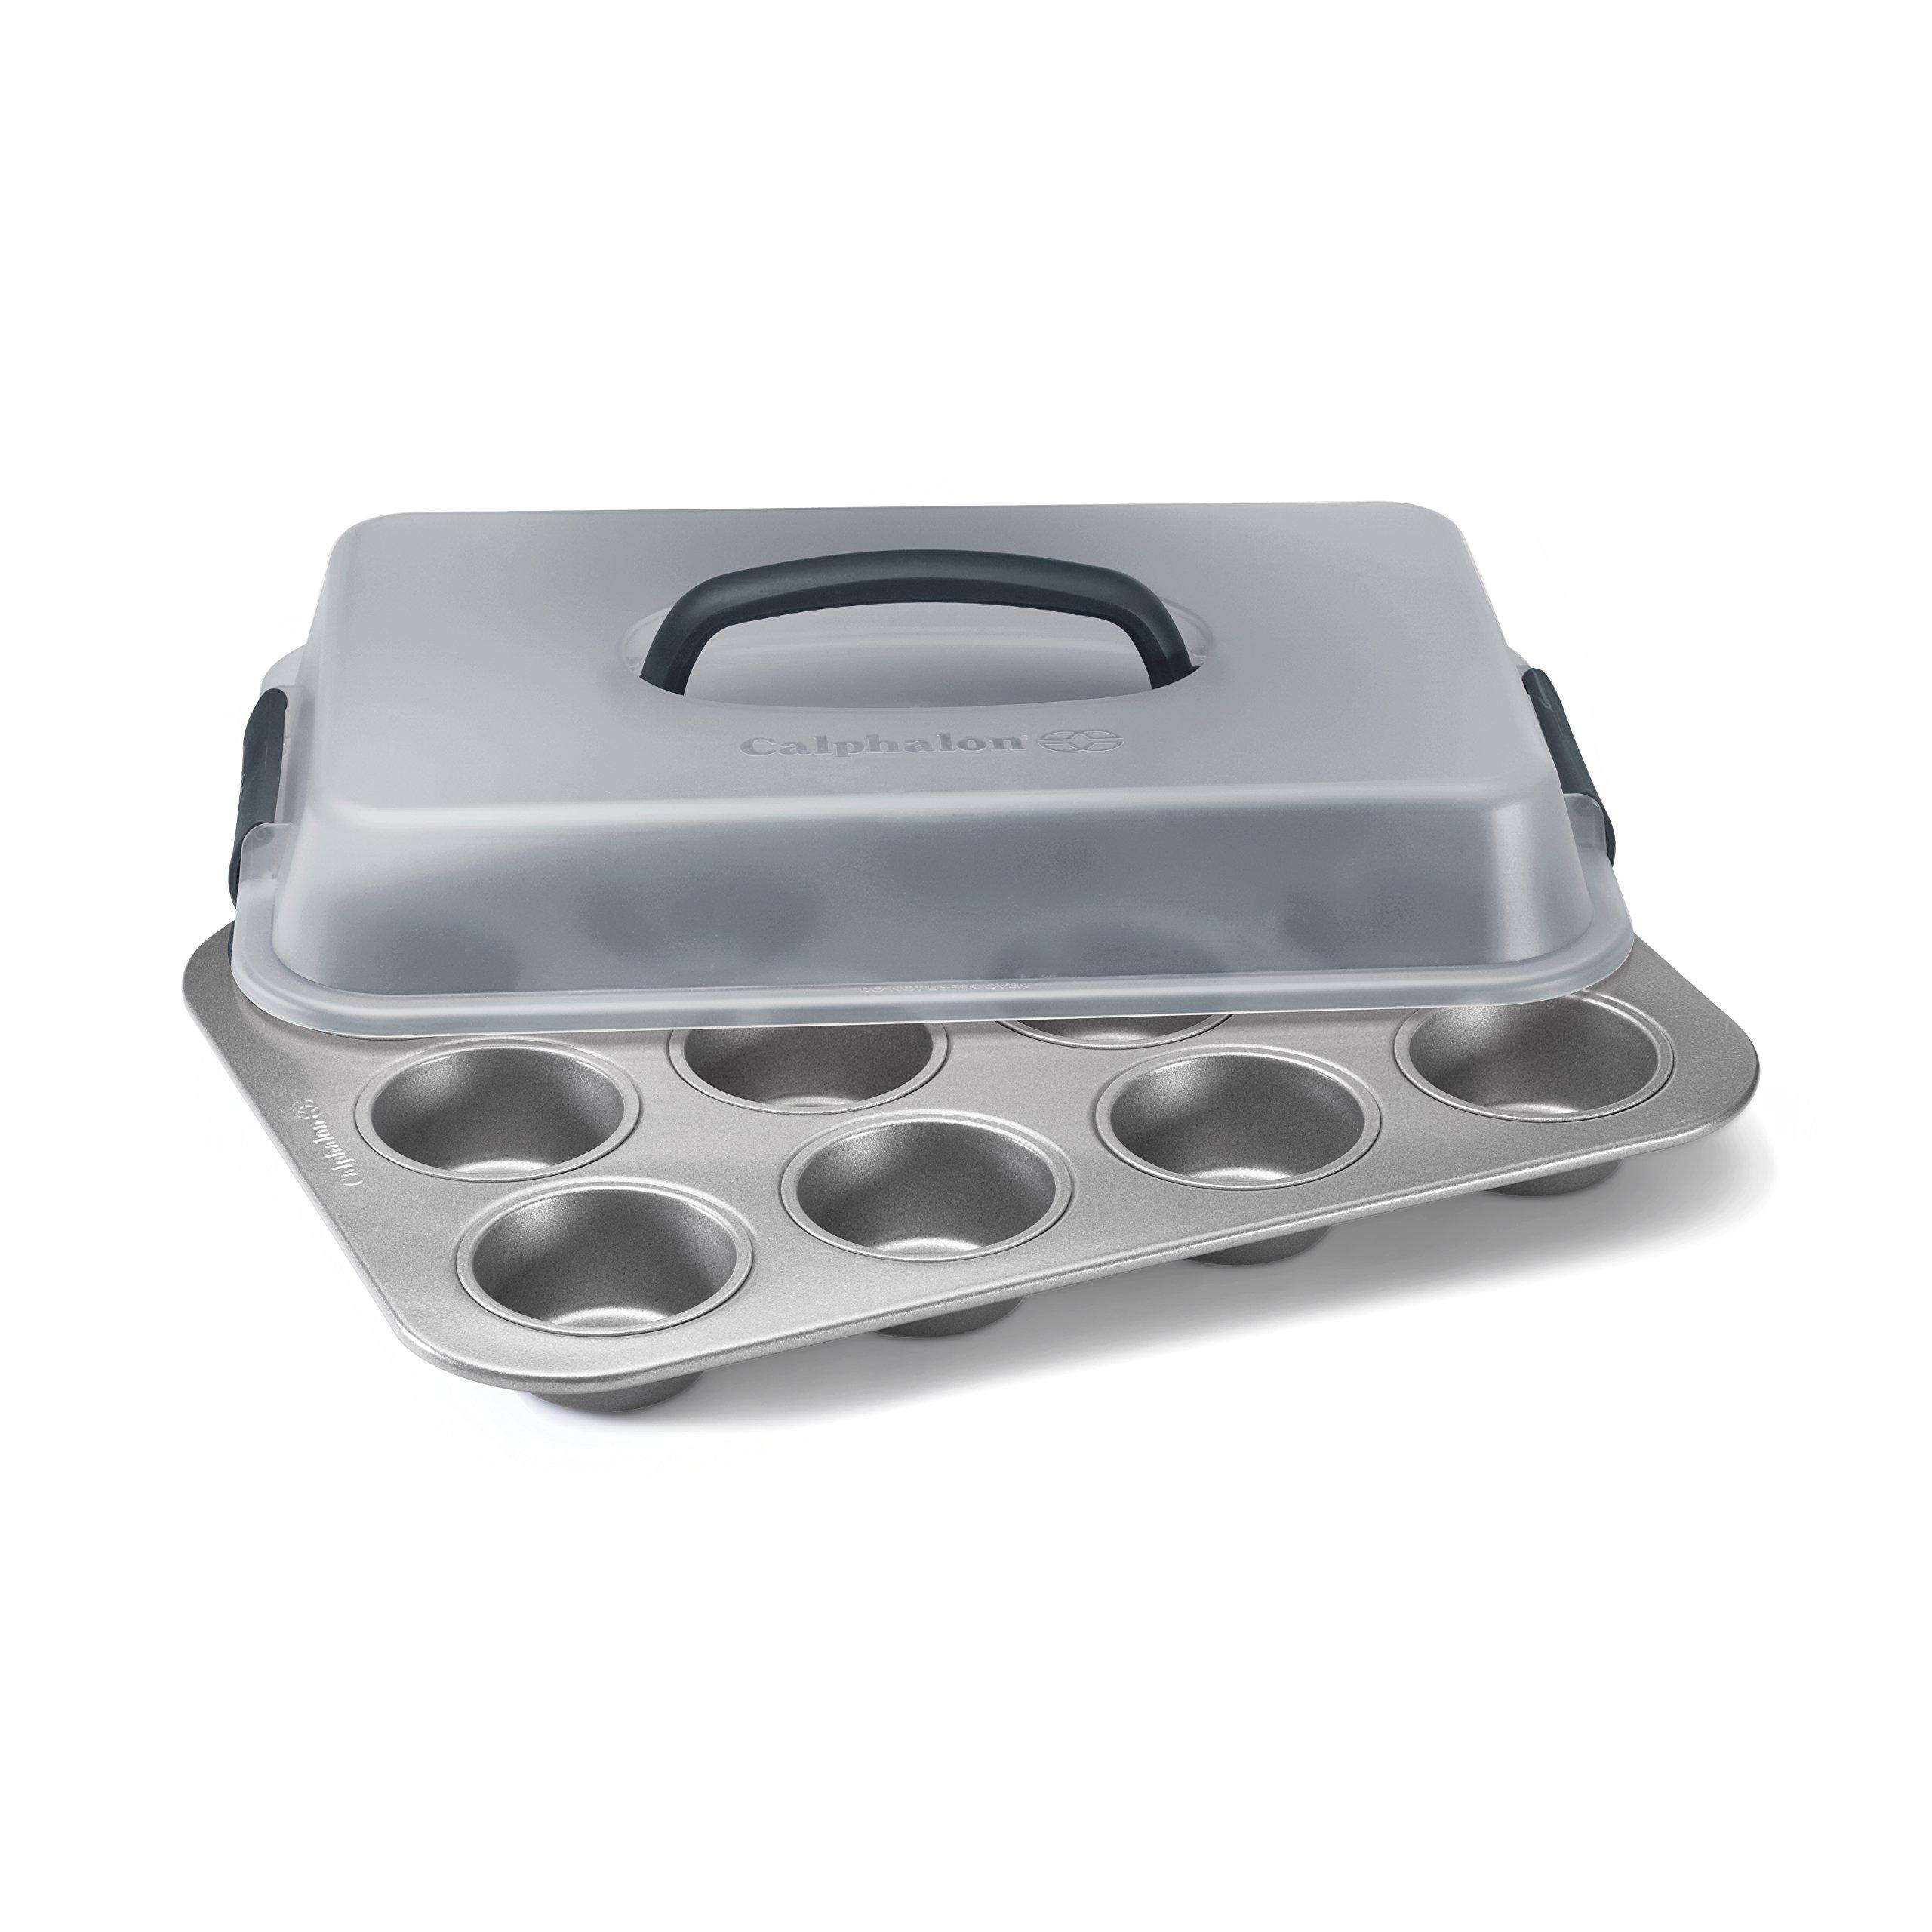 Calphalon Nonstick Bakeware 12-Cup Covered Cupcake Pan, 9'' x 13''